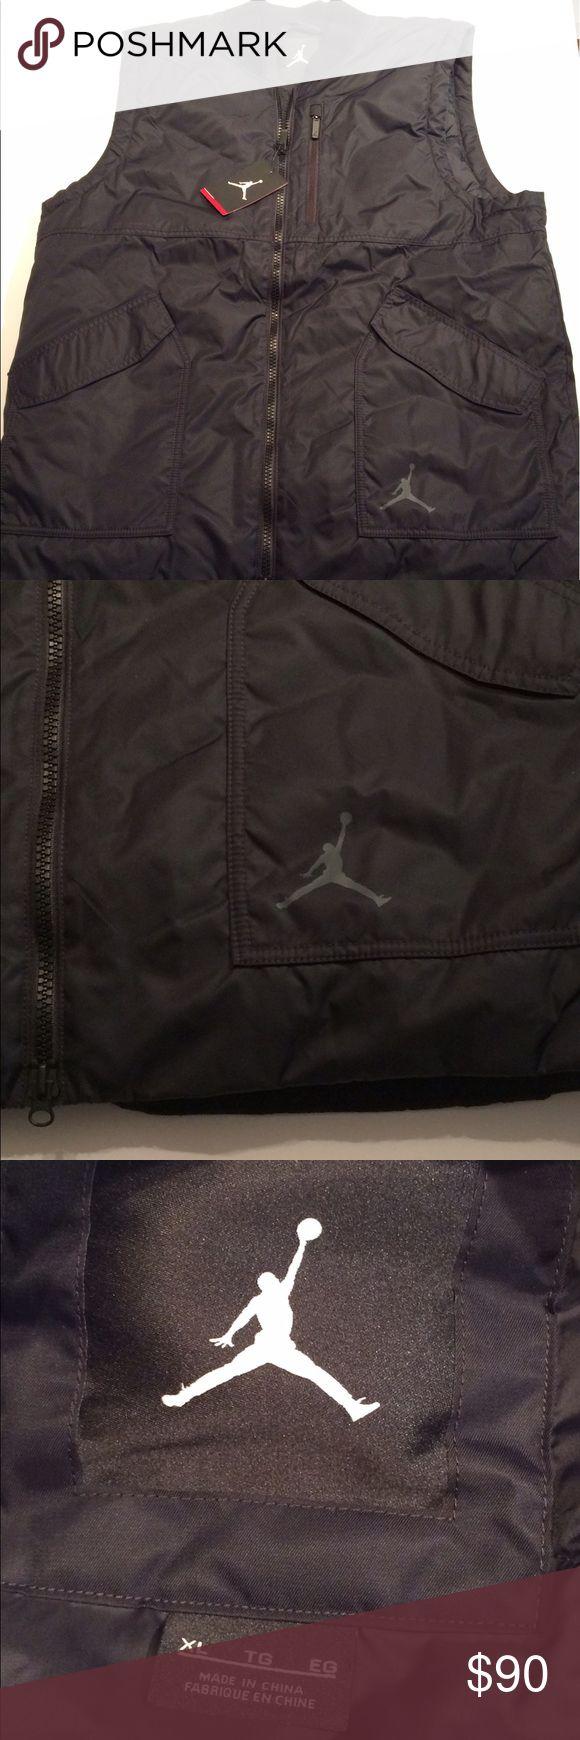 Retro Jordan vest All black with gray jumpman logo on left pocket. Available in XL OR L Nike Jackets & Coats Vests